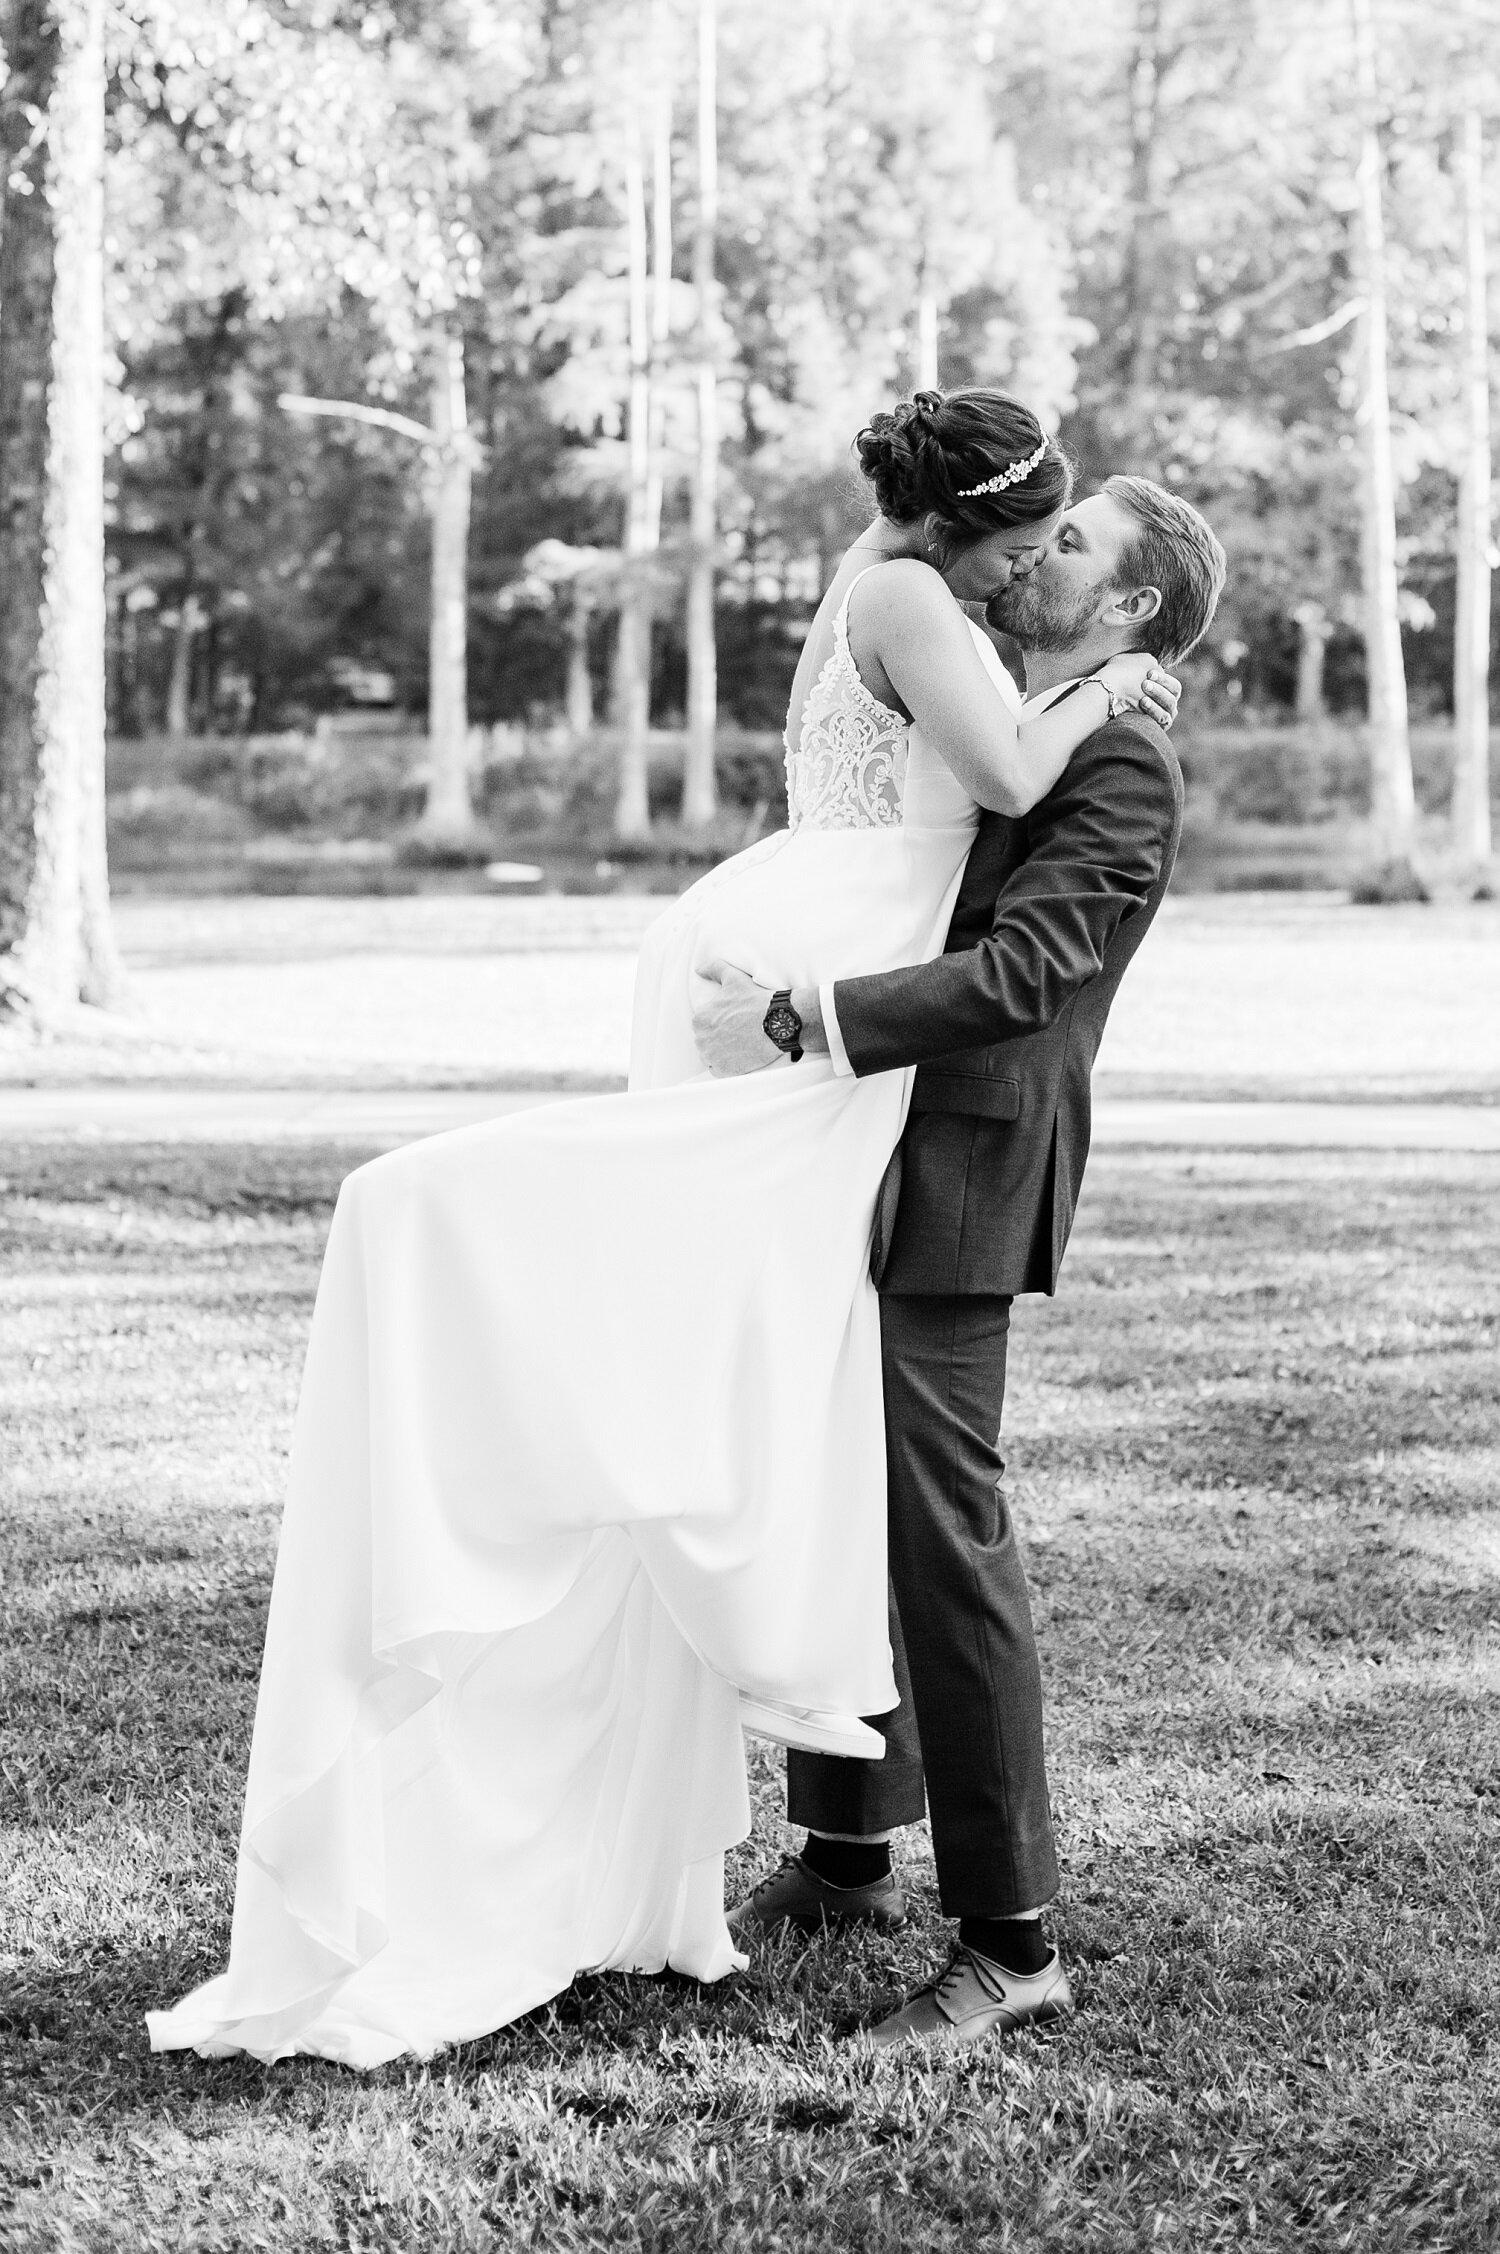 Gamberi Wedding - Shea's Favorites 3_-15.jpg